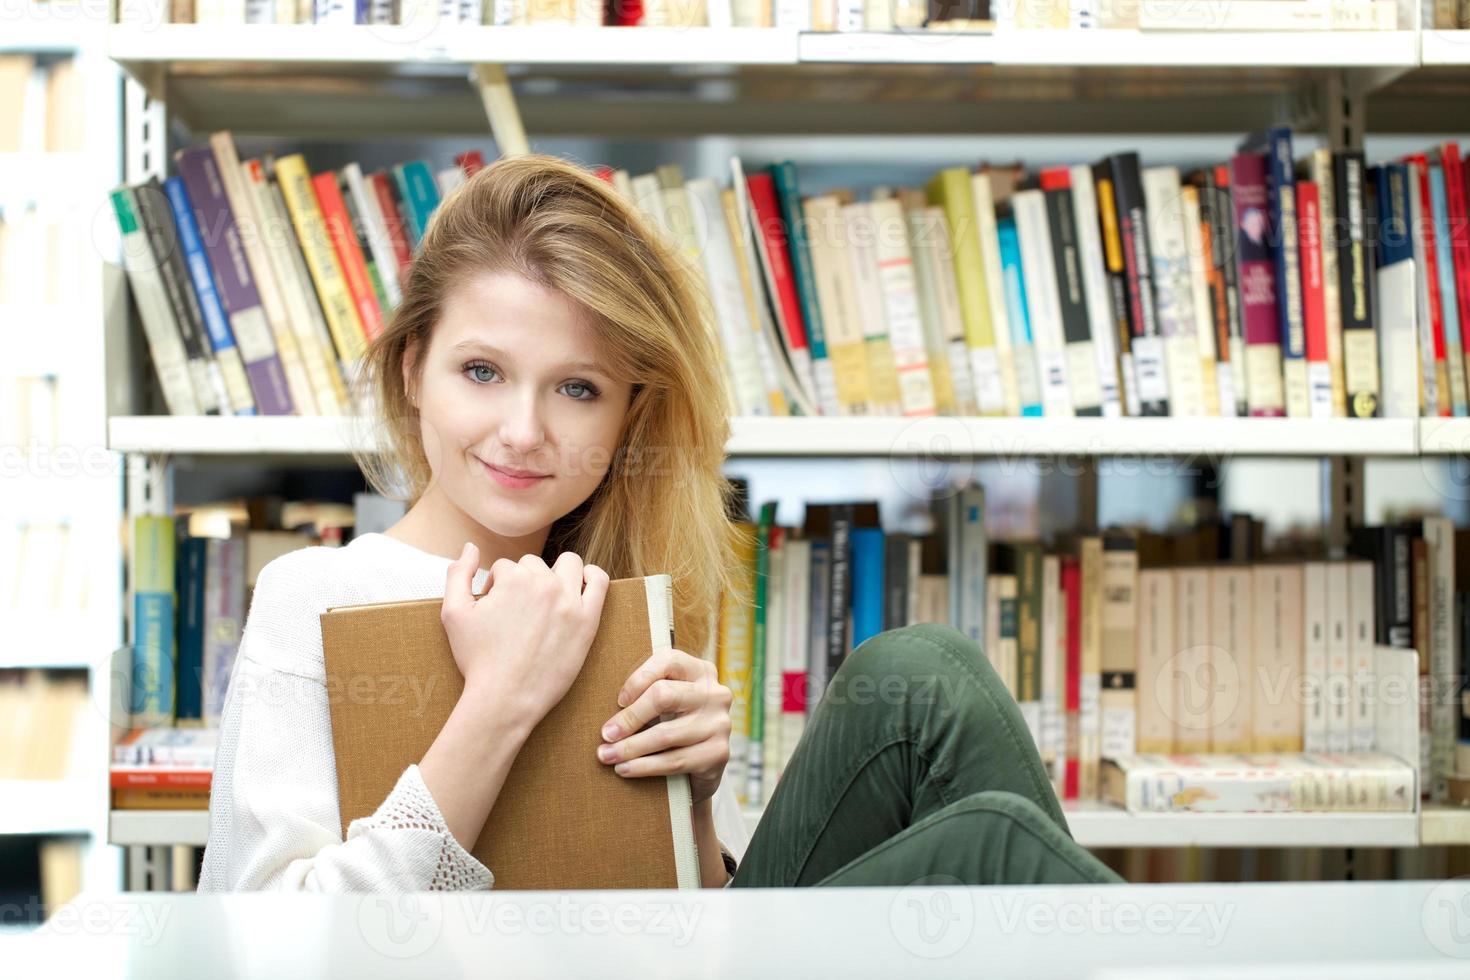 Studentenporträt foto